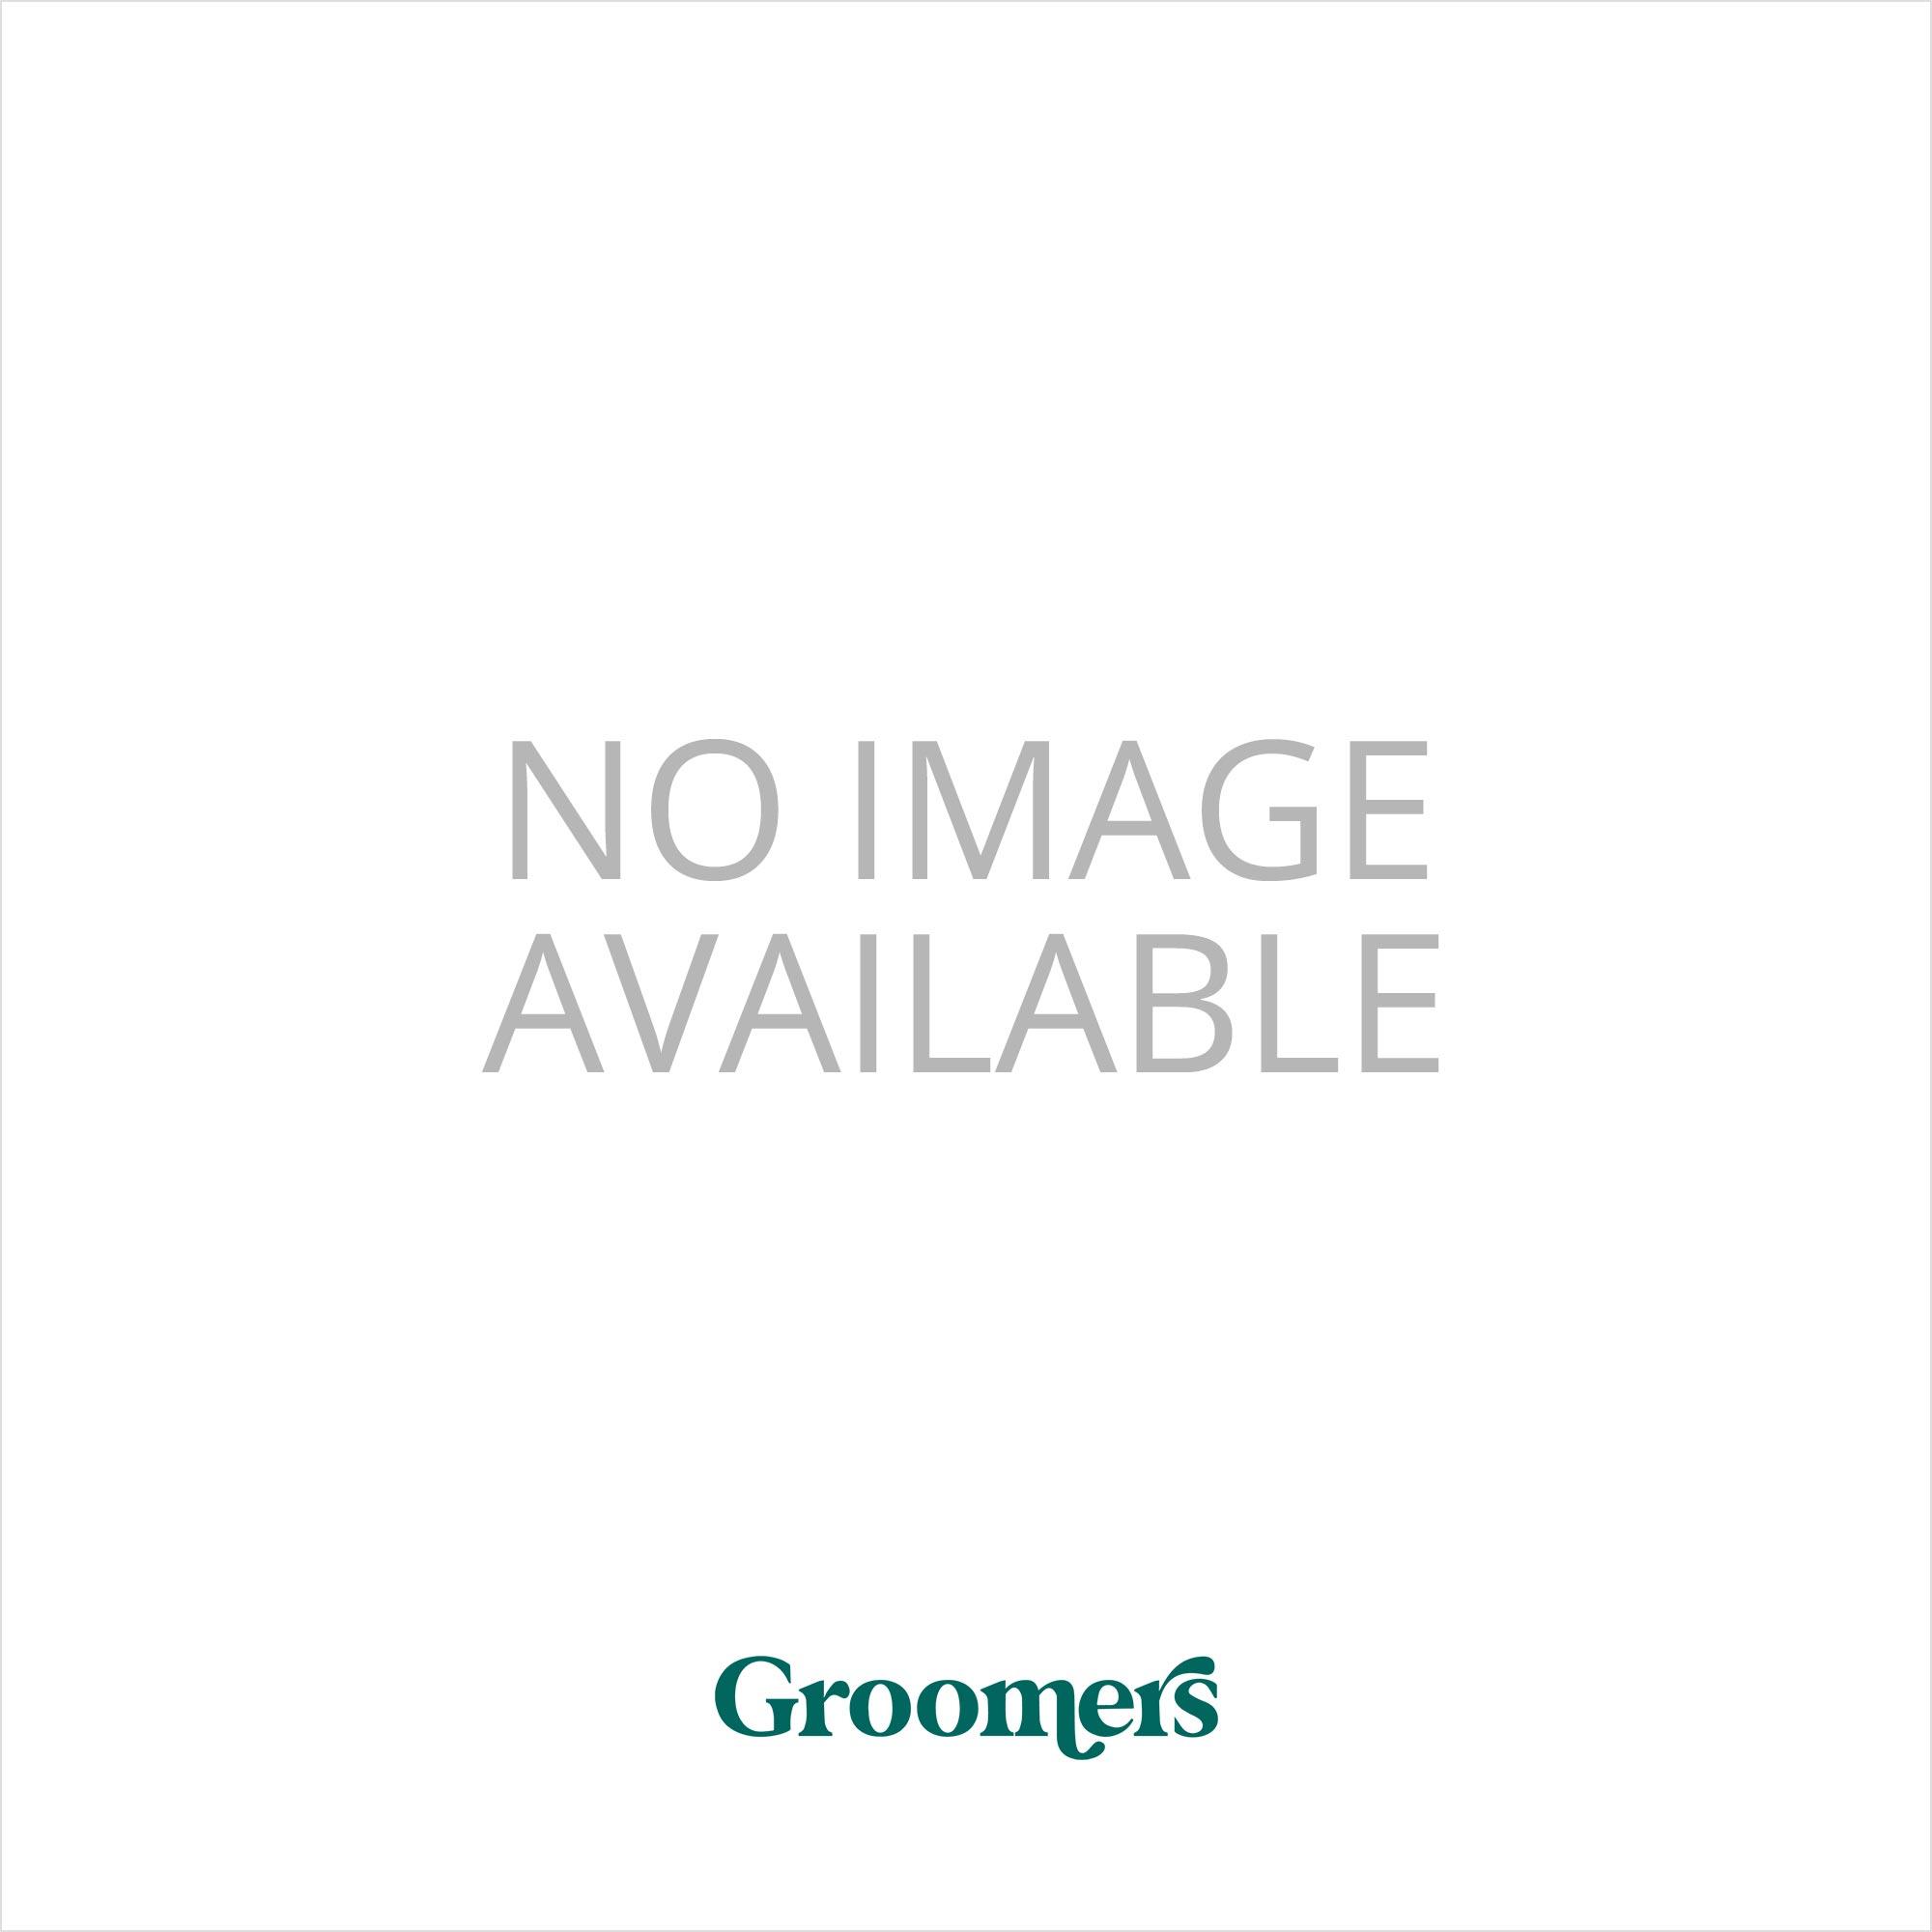 Grooming Artero Beauty Chalk – White - NEW